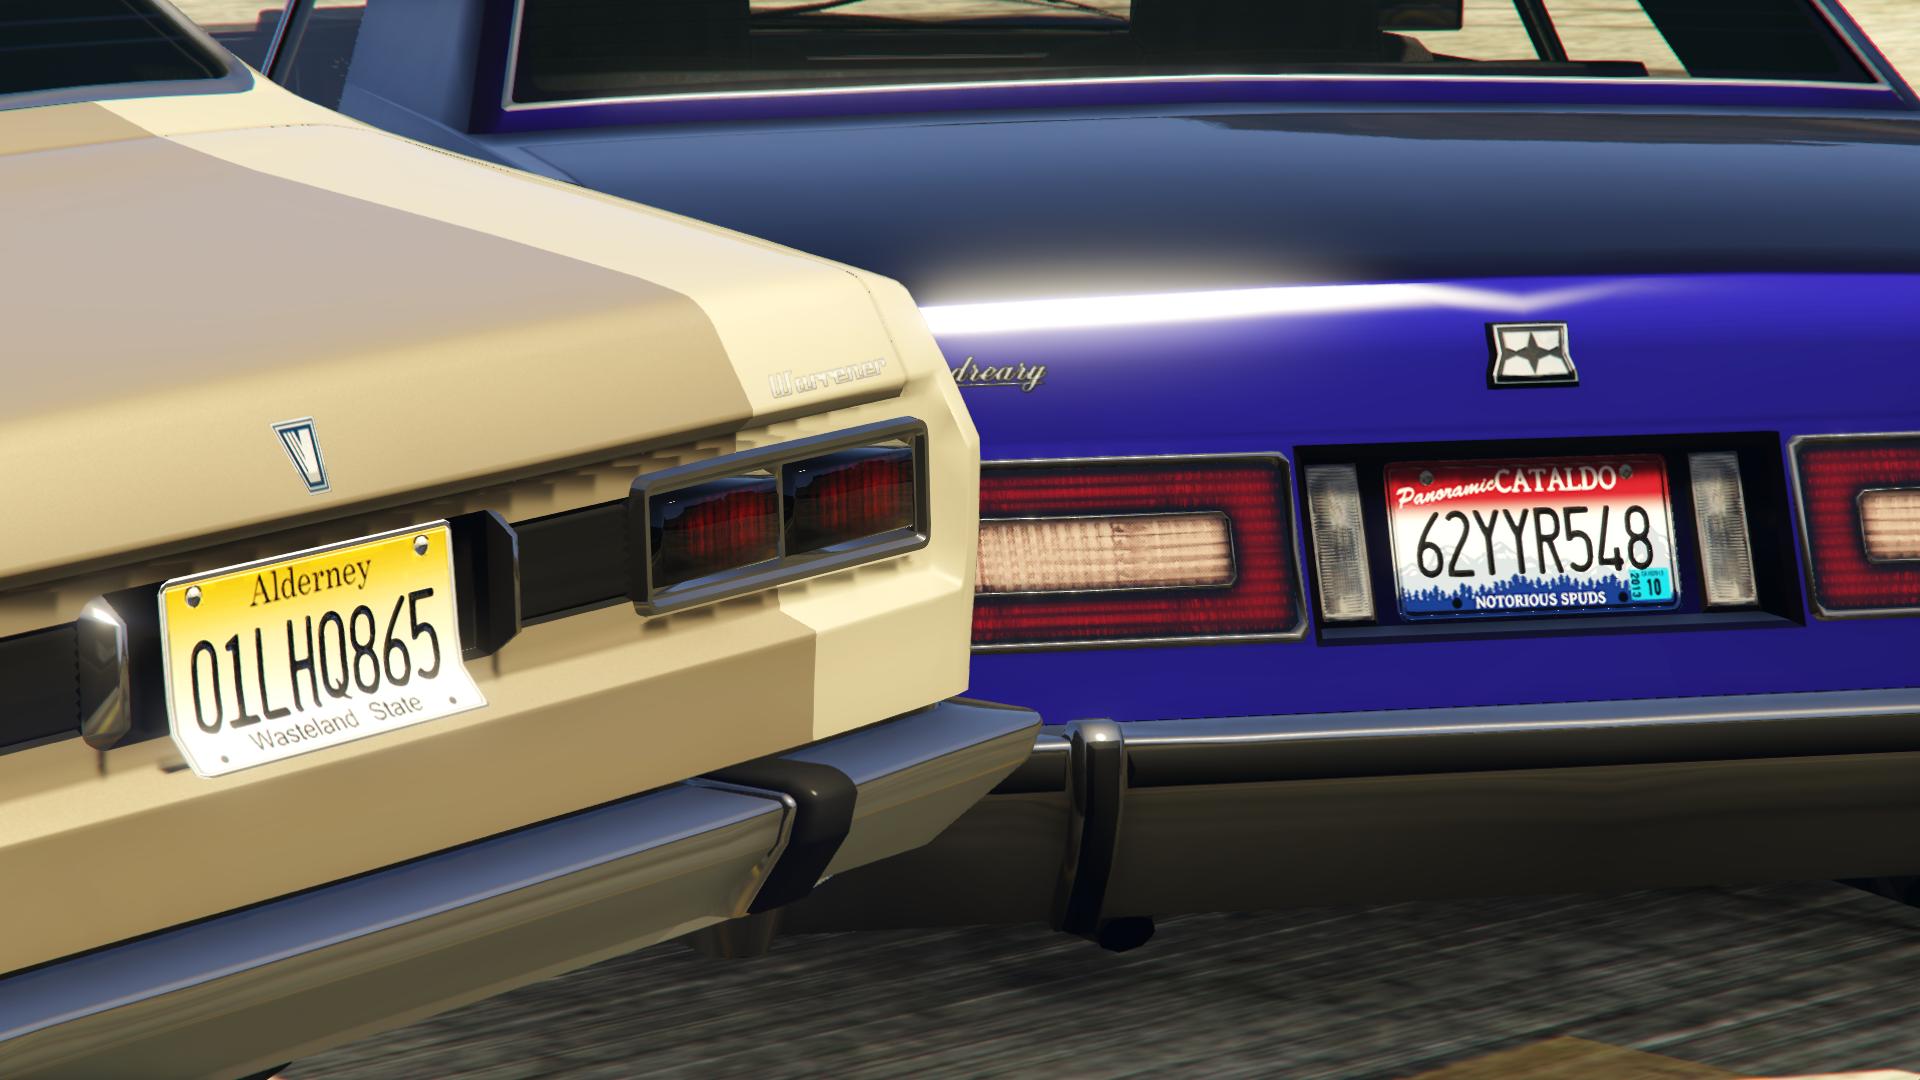 New License Plates [Add-On] - GTA5-Mods.com